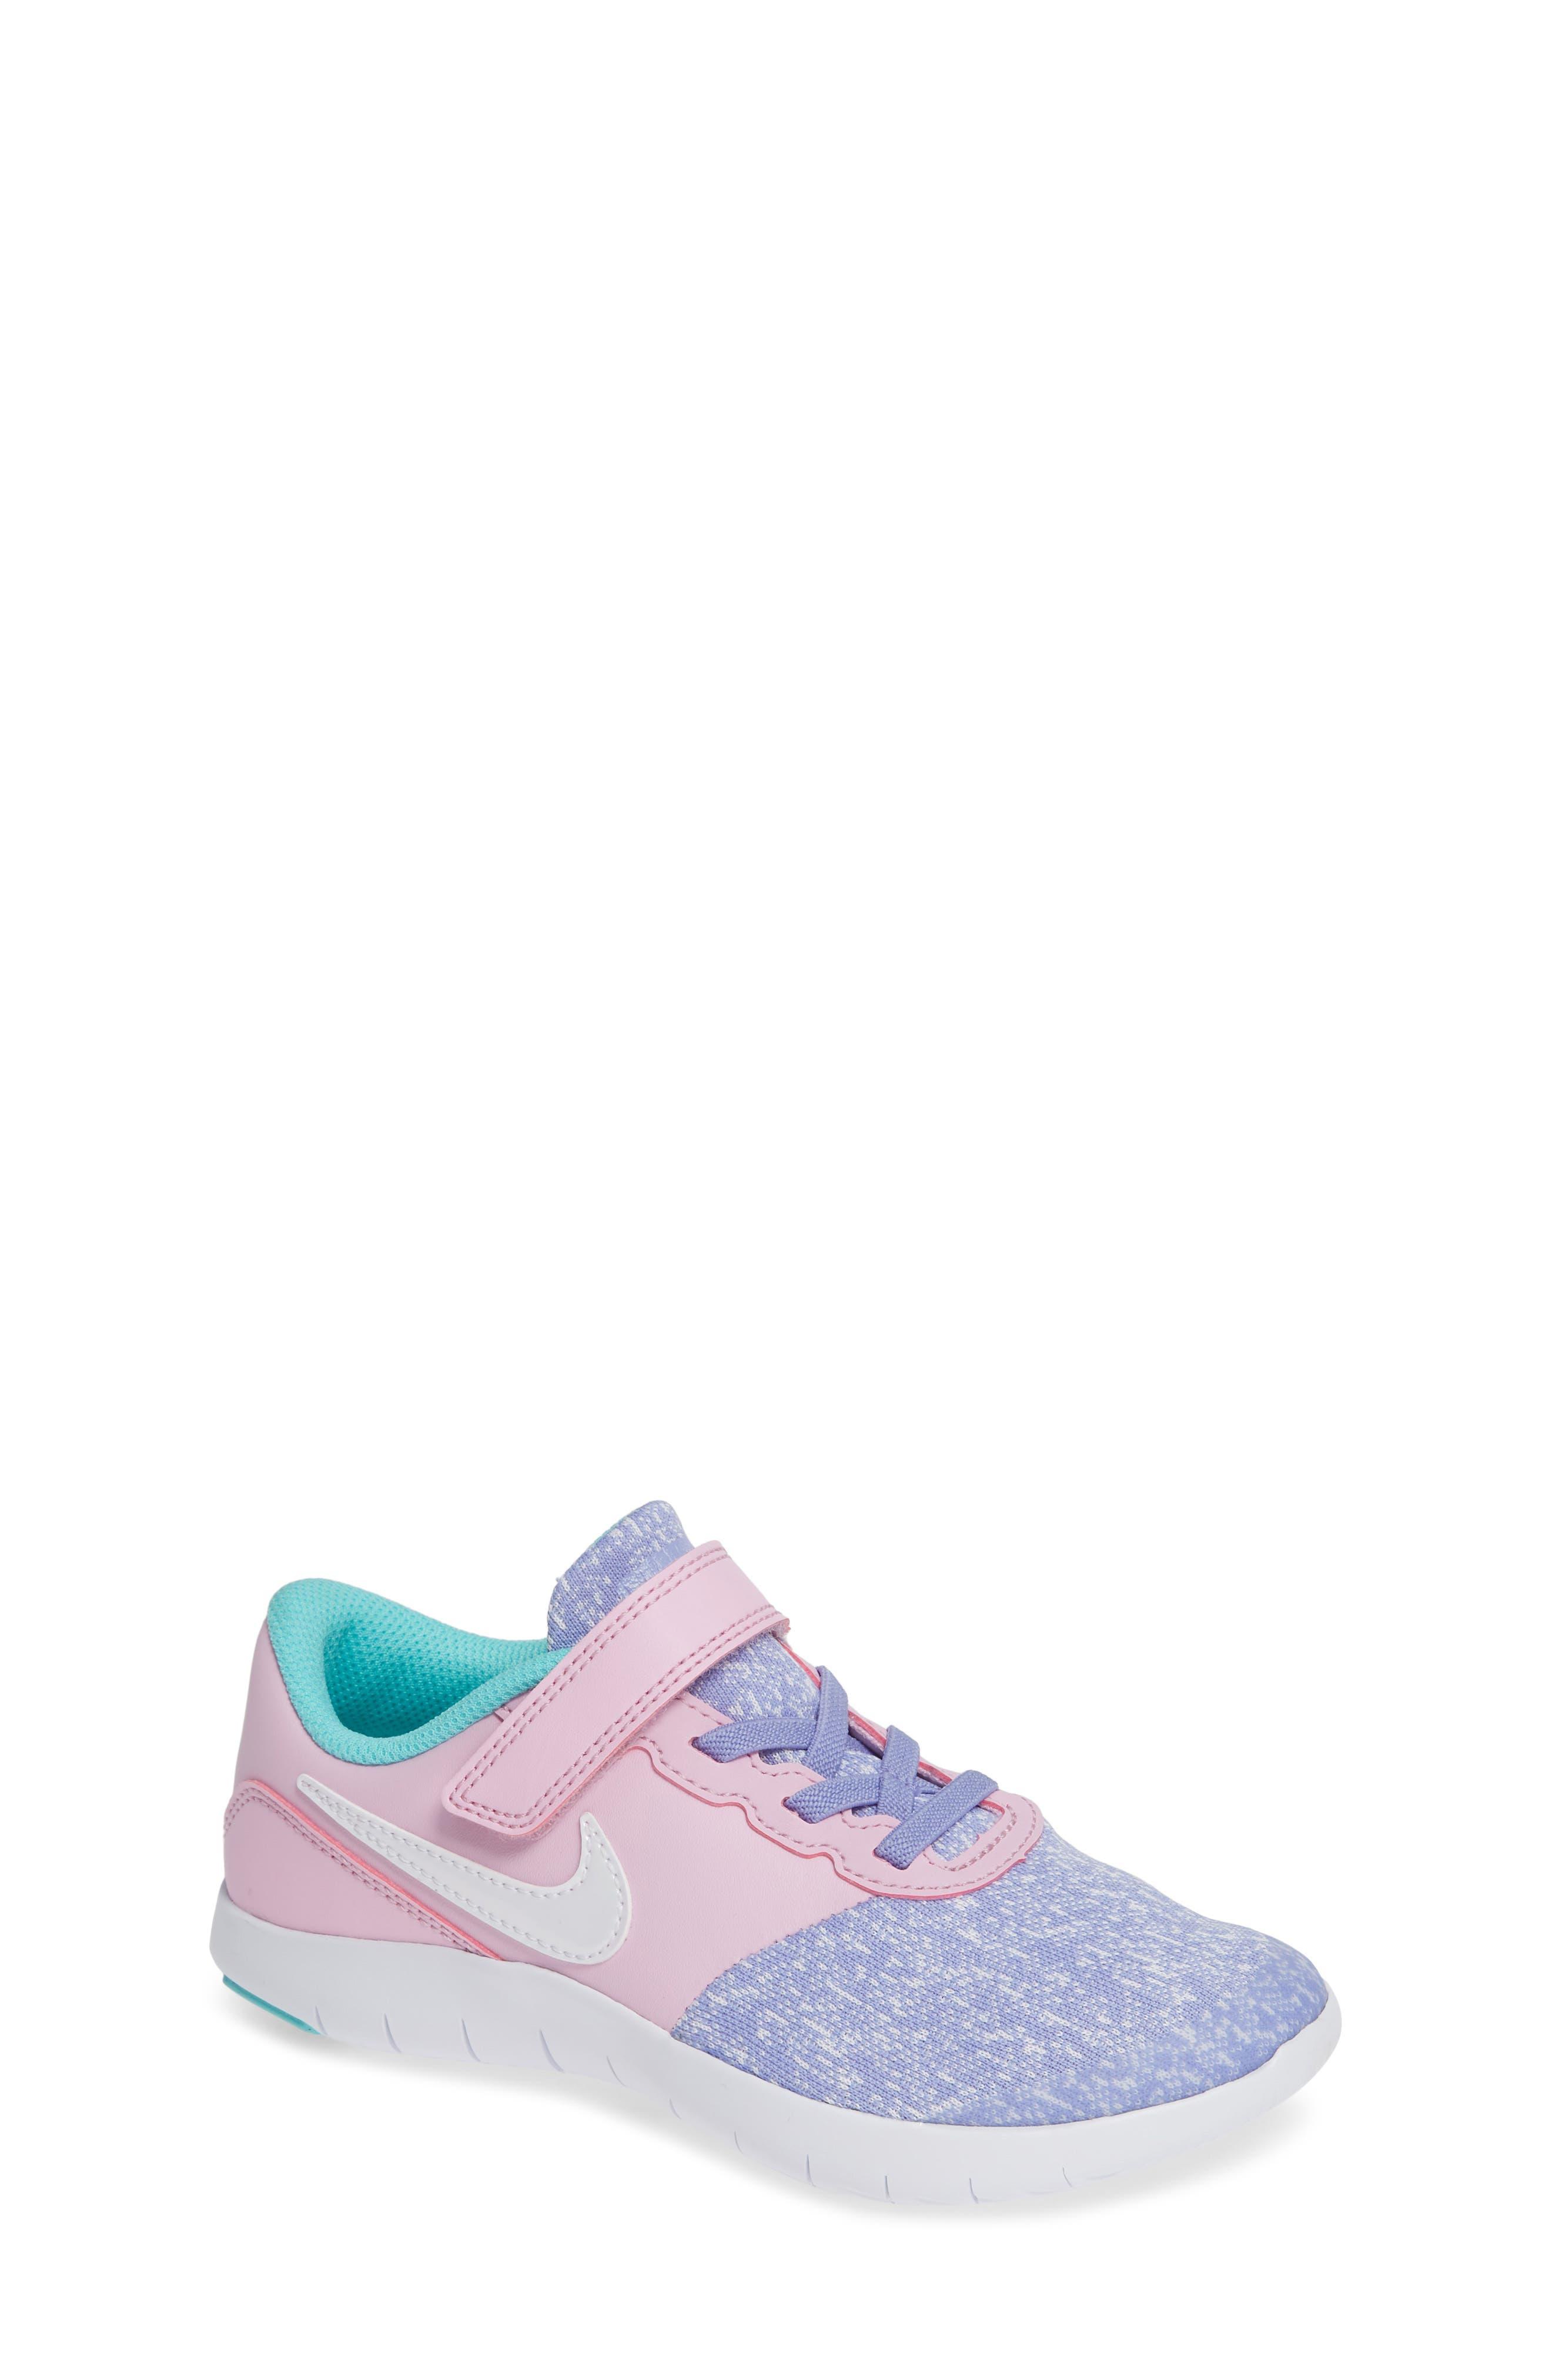 NIKE Flex Contact Running Shoe, Main, color, TWILIGHT PULSE WHITE AQUA